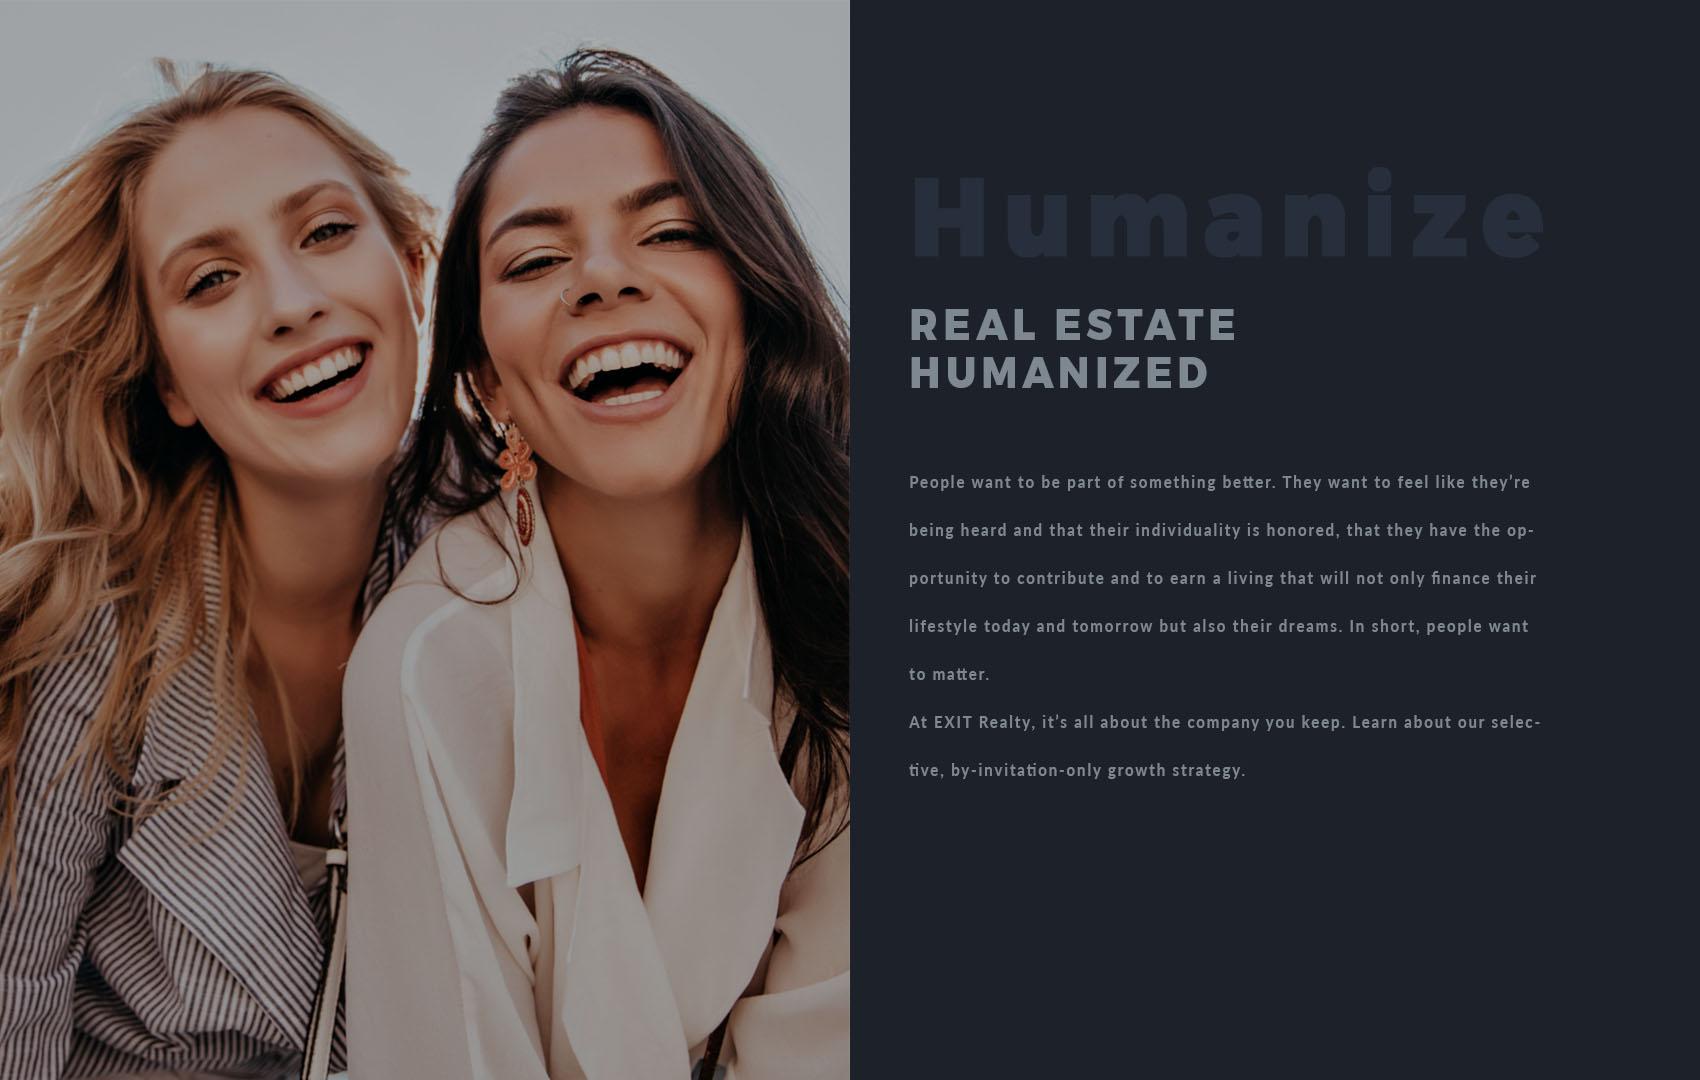 Humanize.jpg